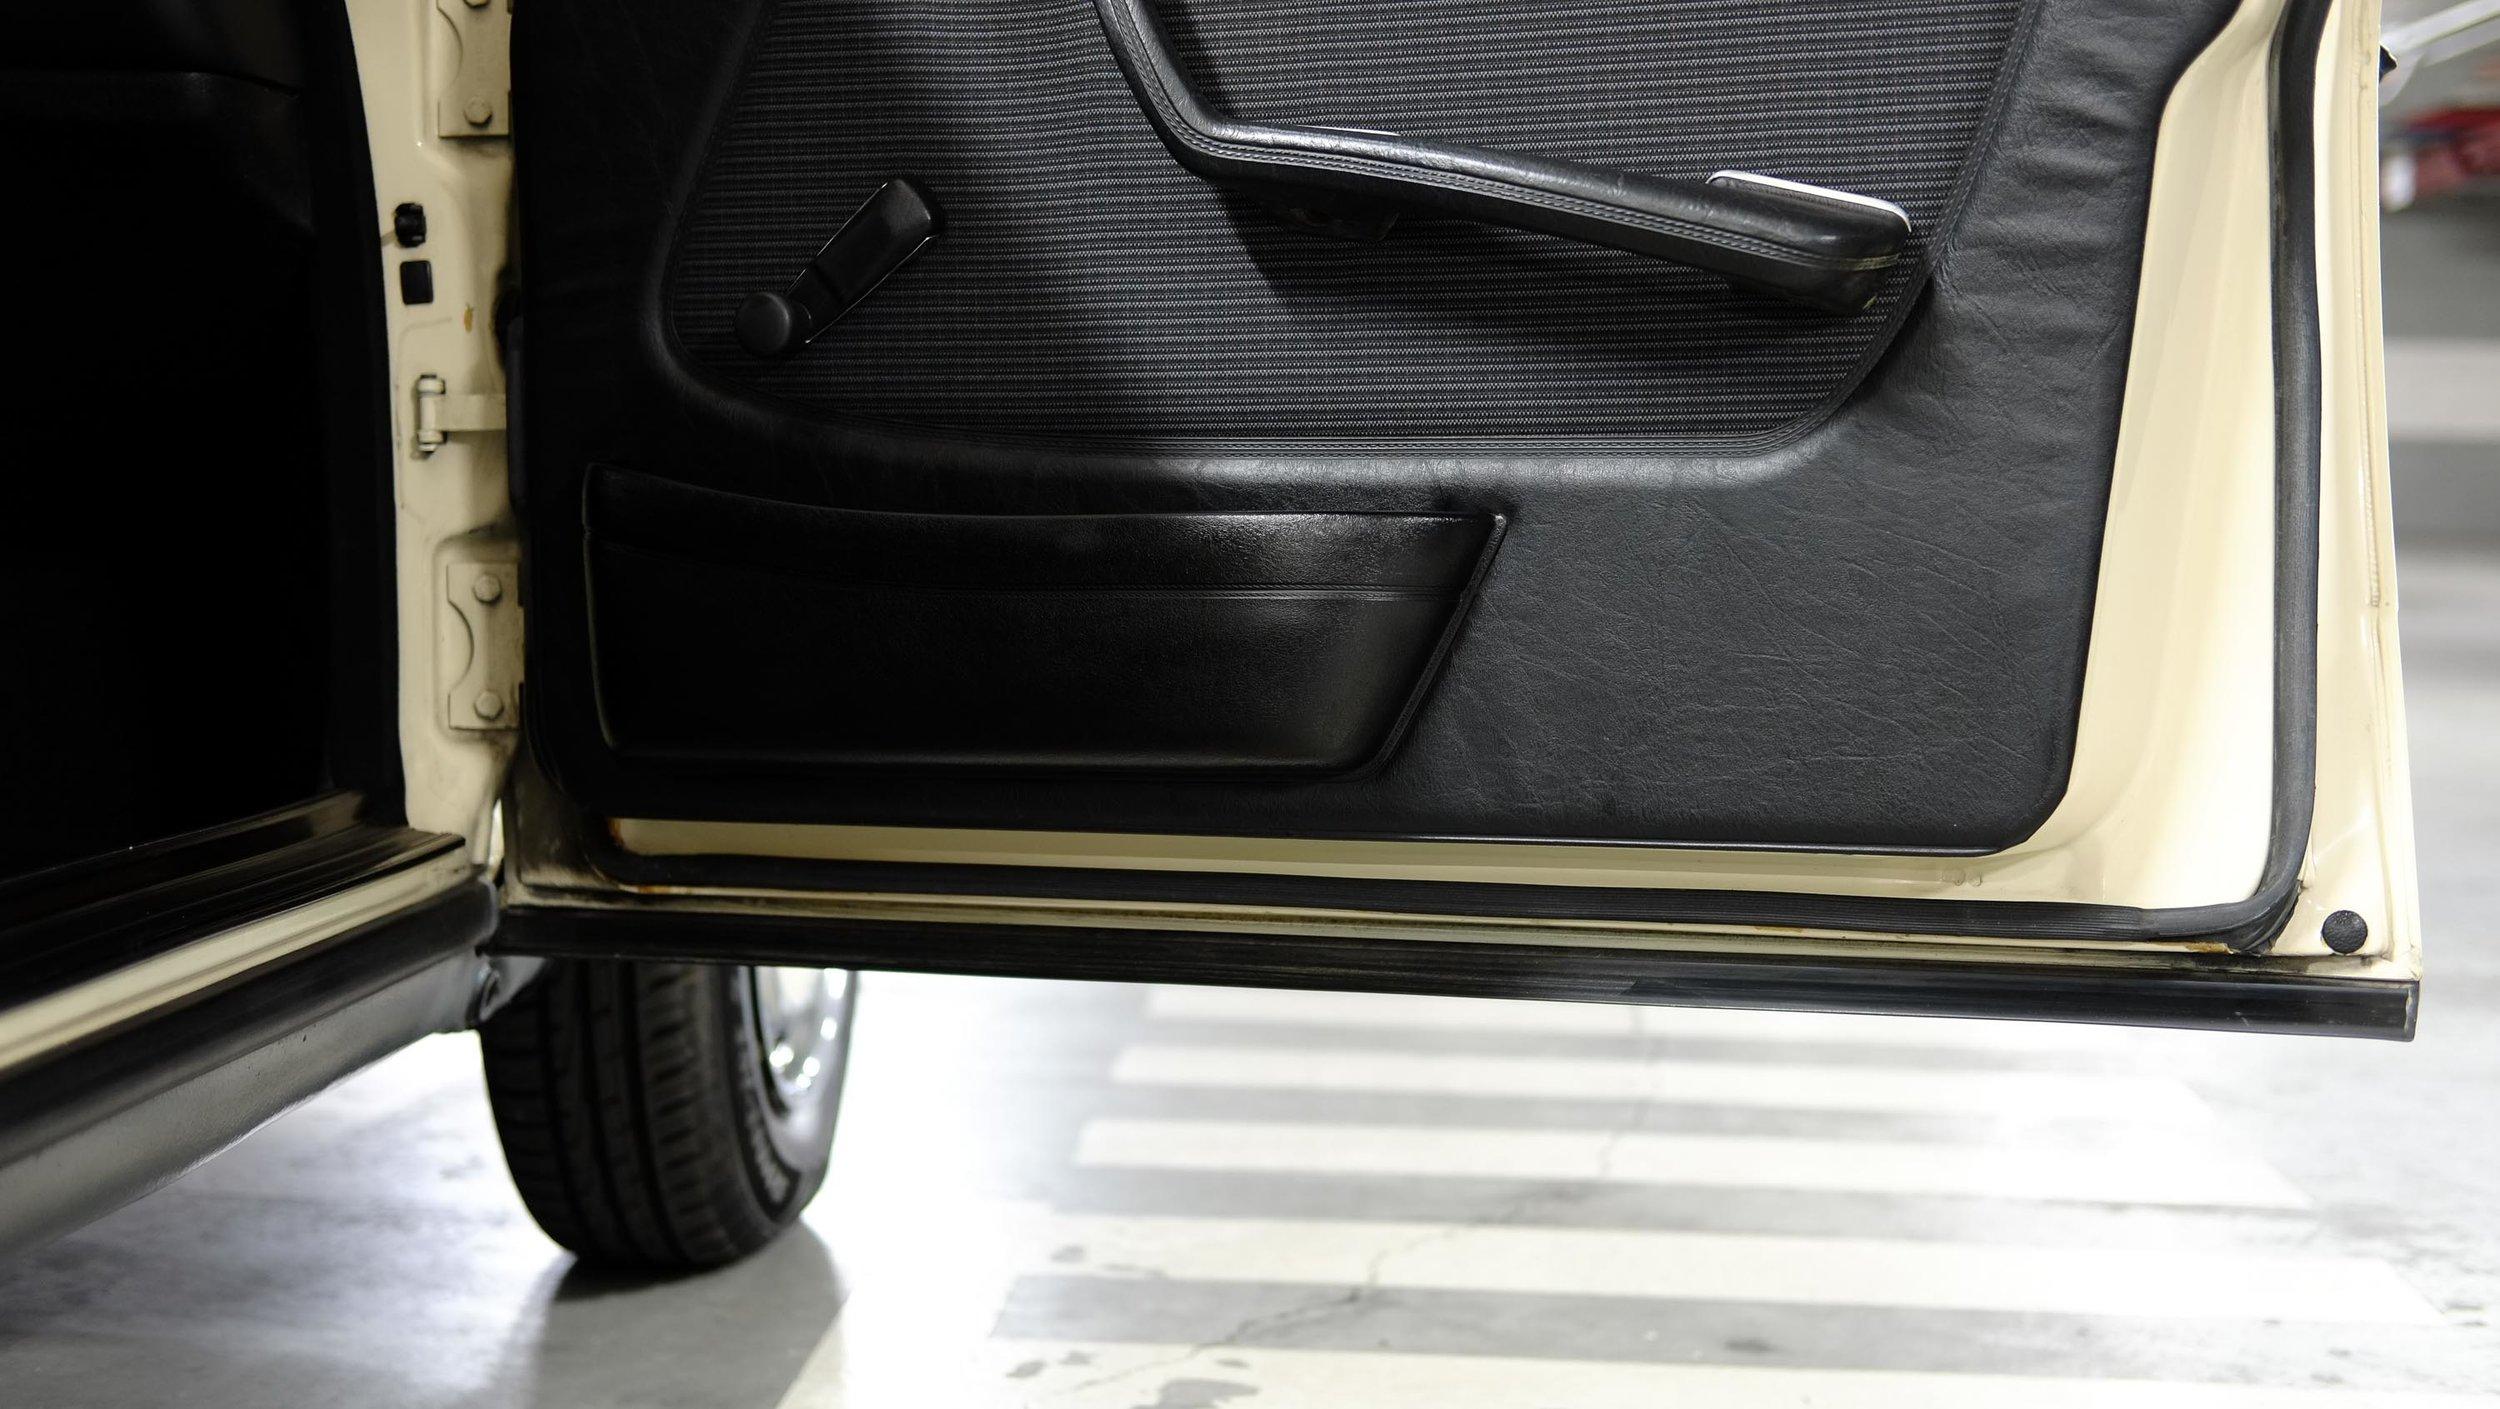 coolnvintage Mercedes-Benz W123 300D (29 of 59).jpg